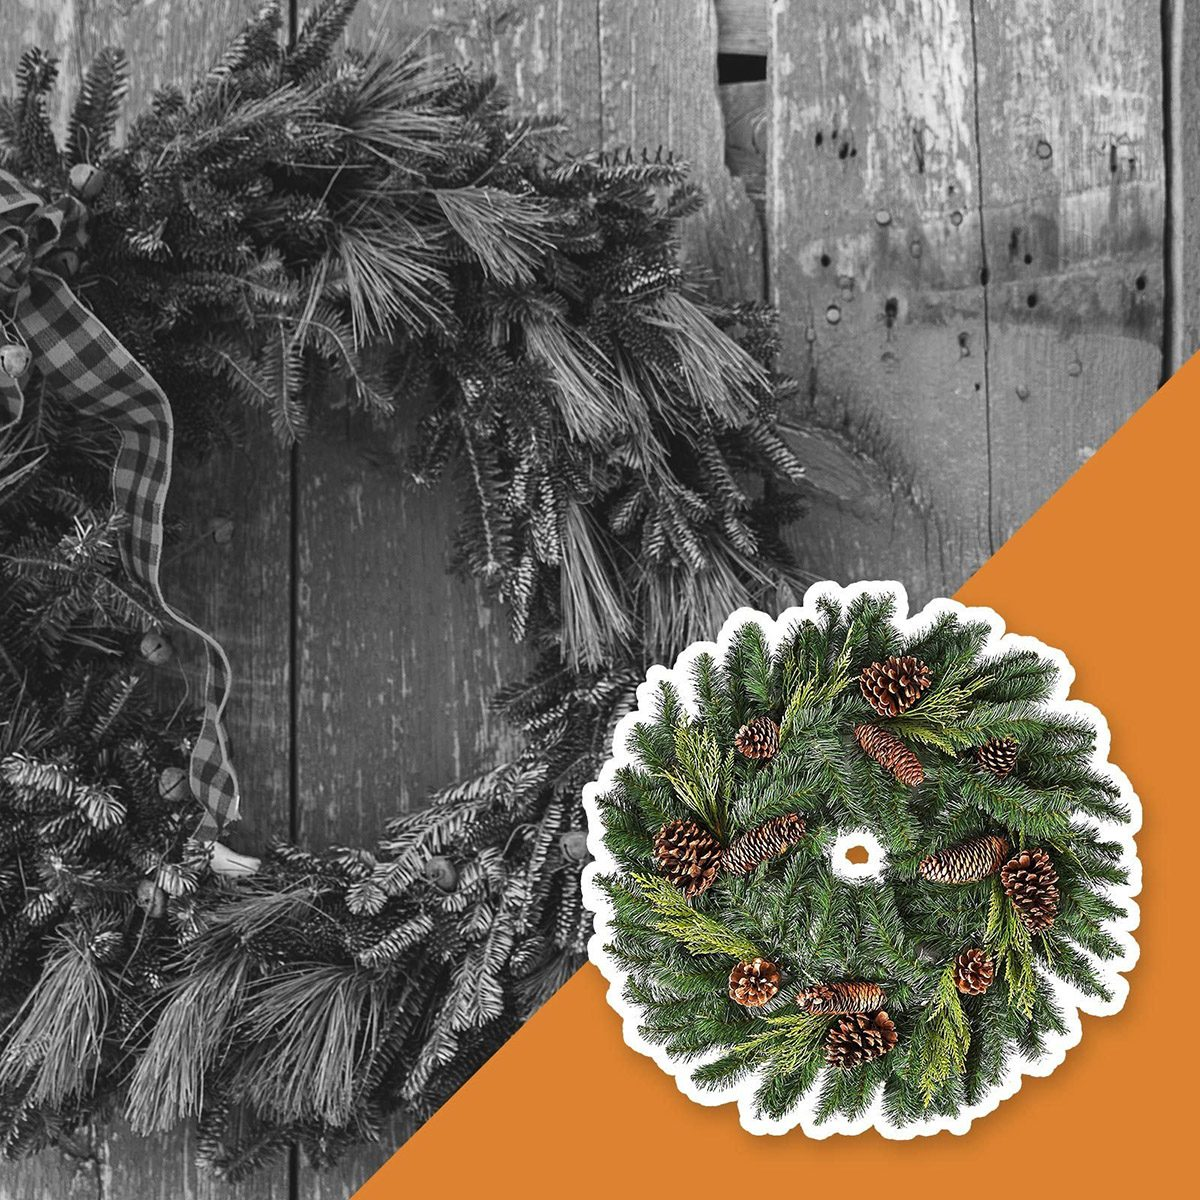 A crumbling fall wreath